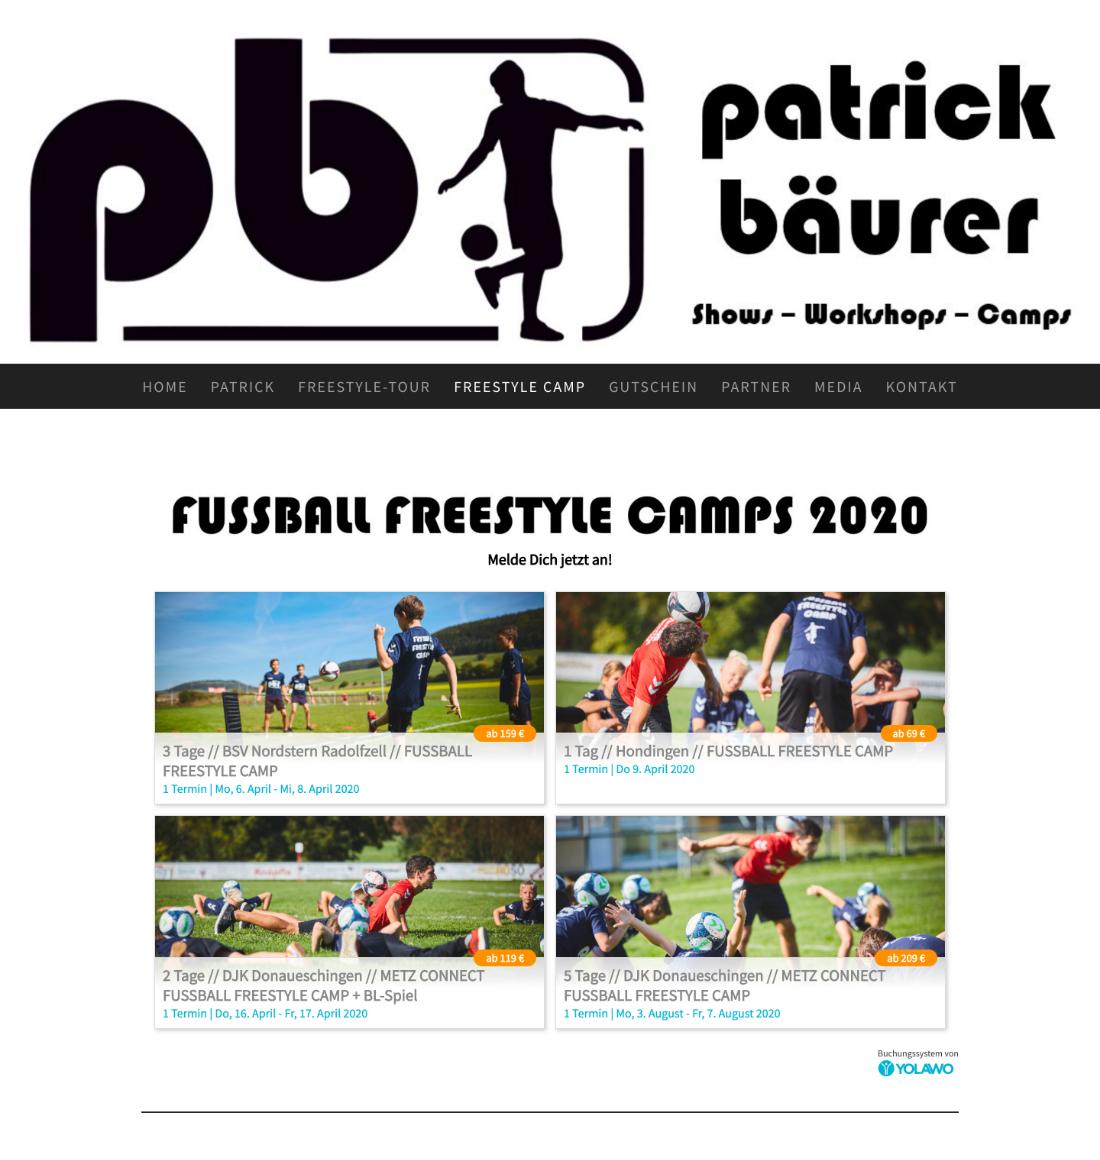 Pb-Fußball